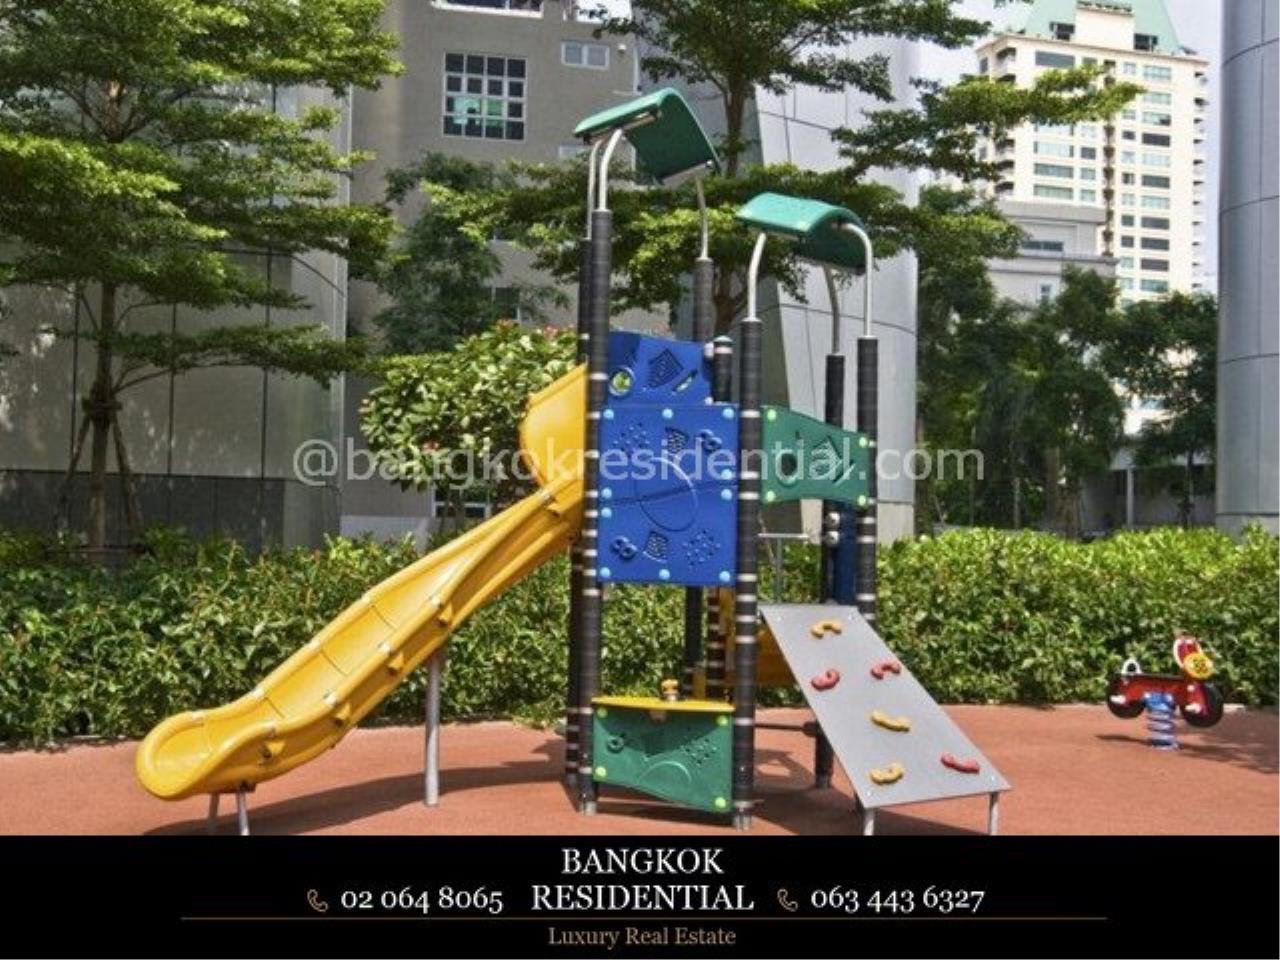 Bangkok Residential Agency's 2BR Millennium Residence For Sale Or Rent (BR1641CD) 20